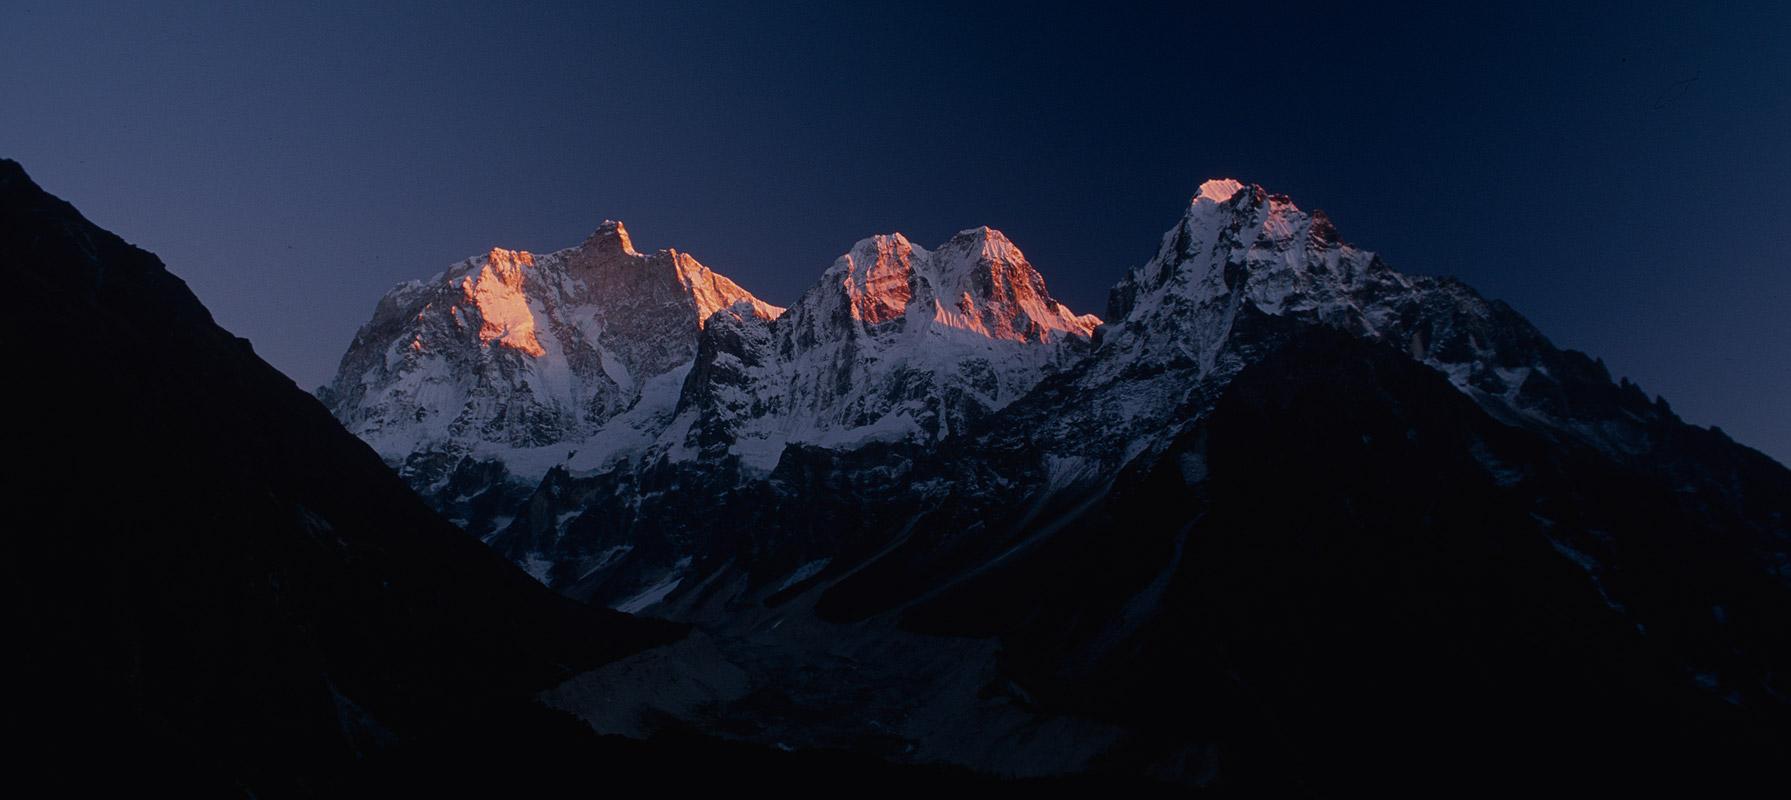 jannu_glacier_sunset_2000RVP